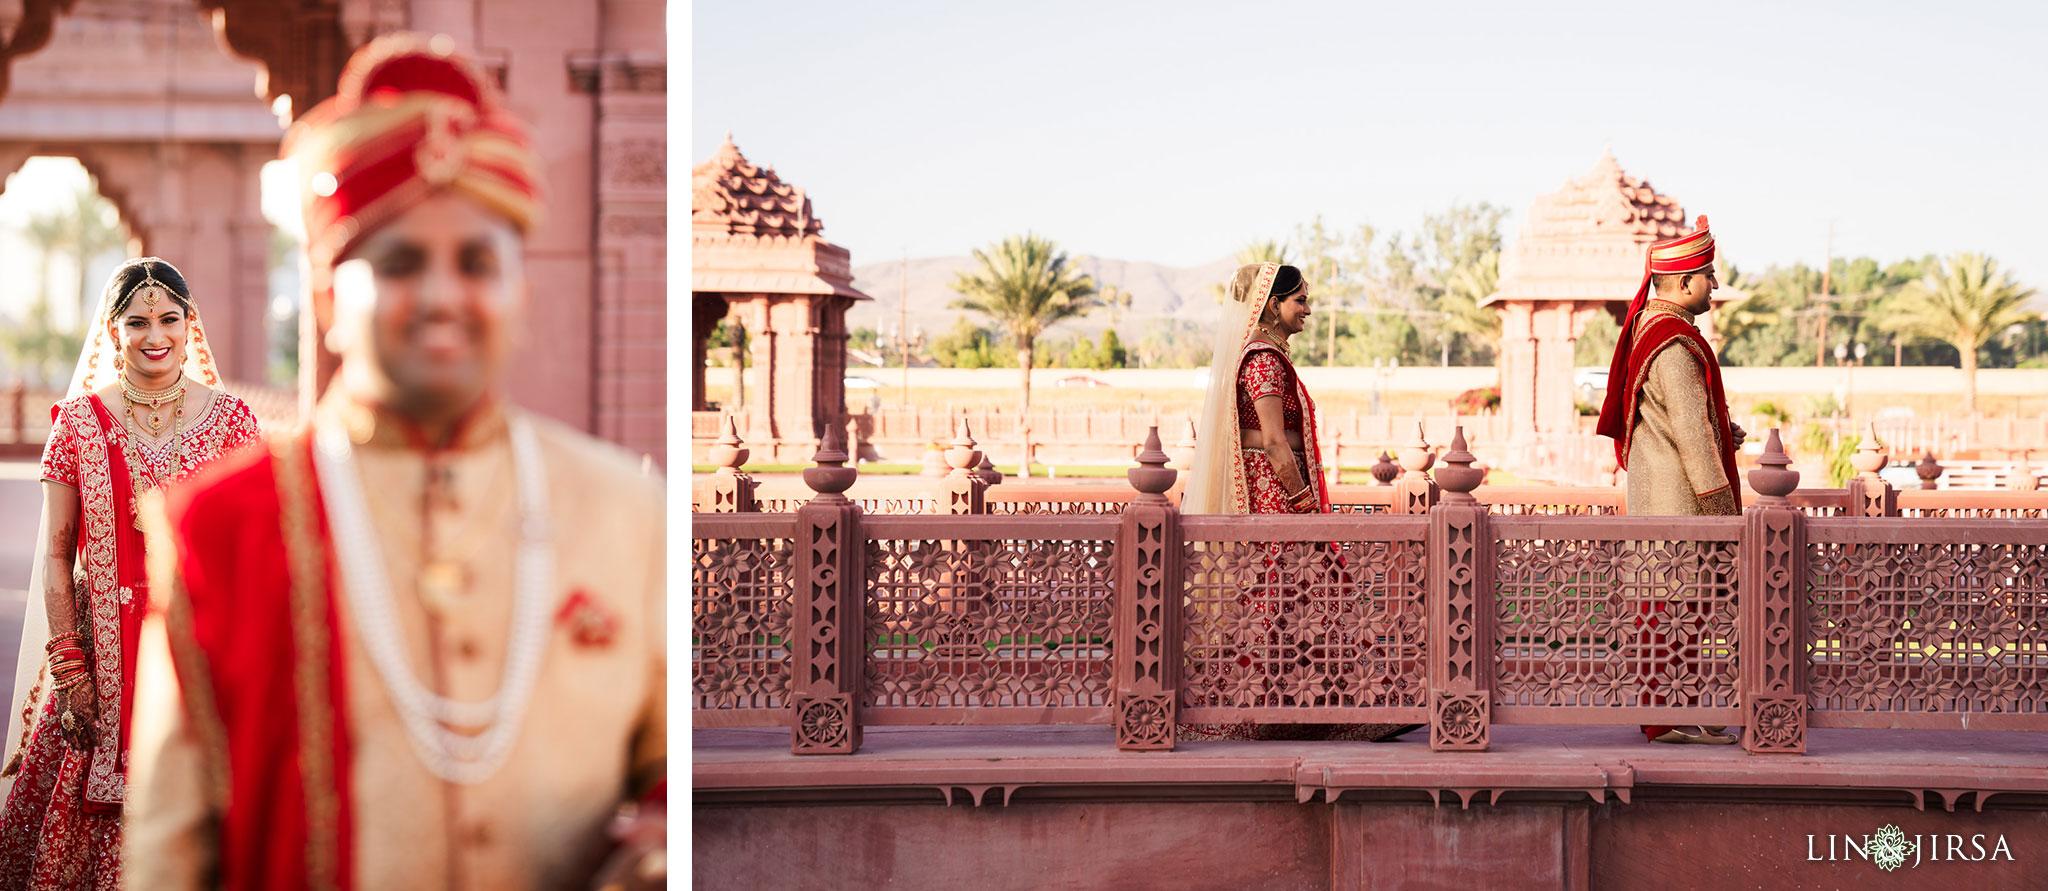 071 BAPS Swaminarayan Mandir Chino Hills Indian Wedding Photography